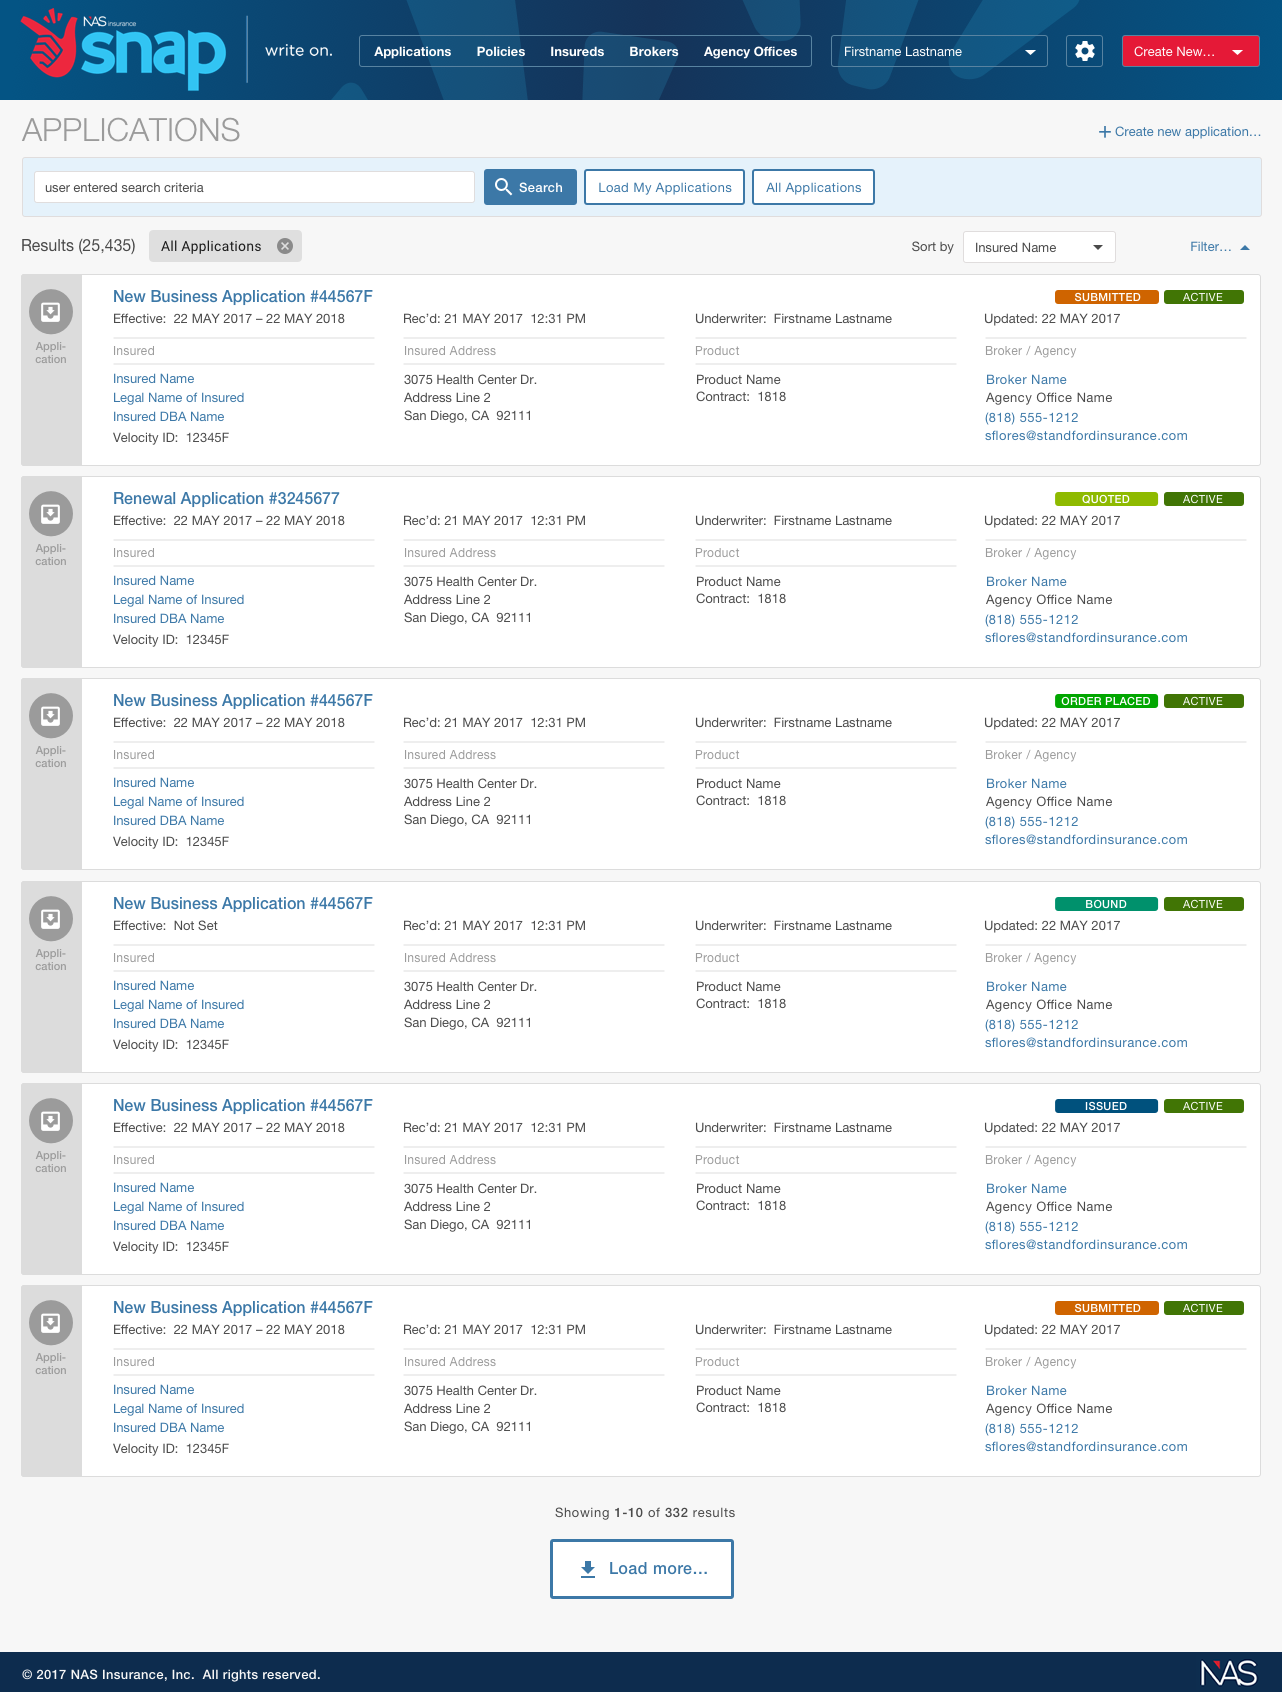 NAS Insurance - Applications Dashboard